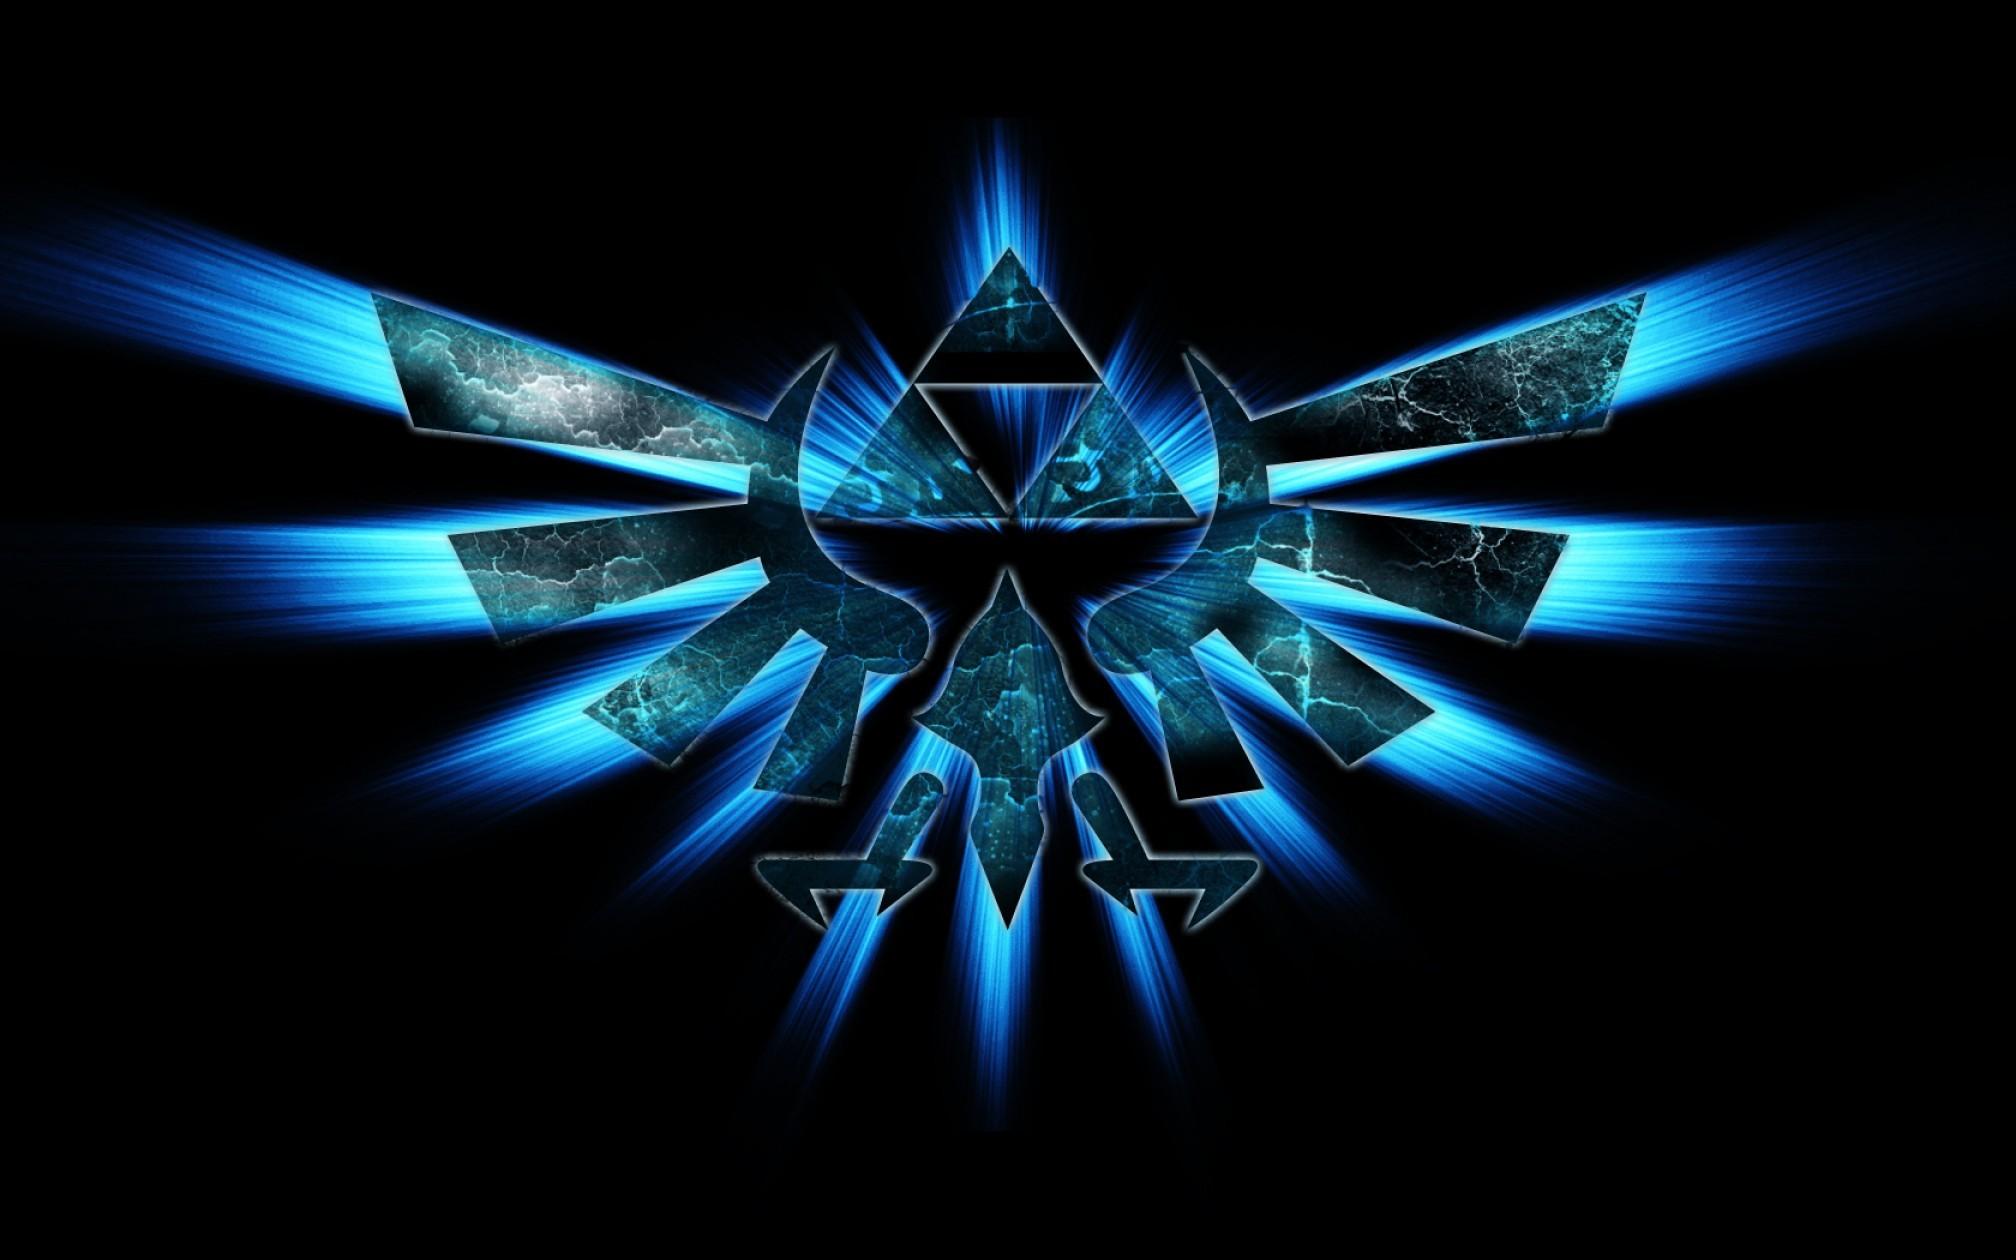 Hd Triforce Wallpaper The Legend Of Zelda Graphic   Vectory